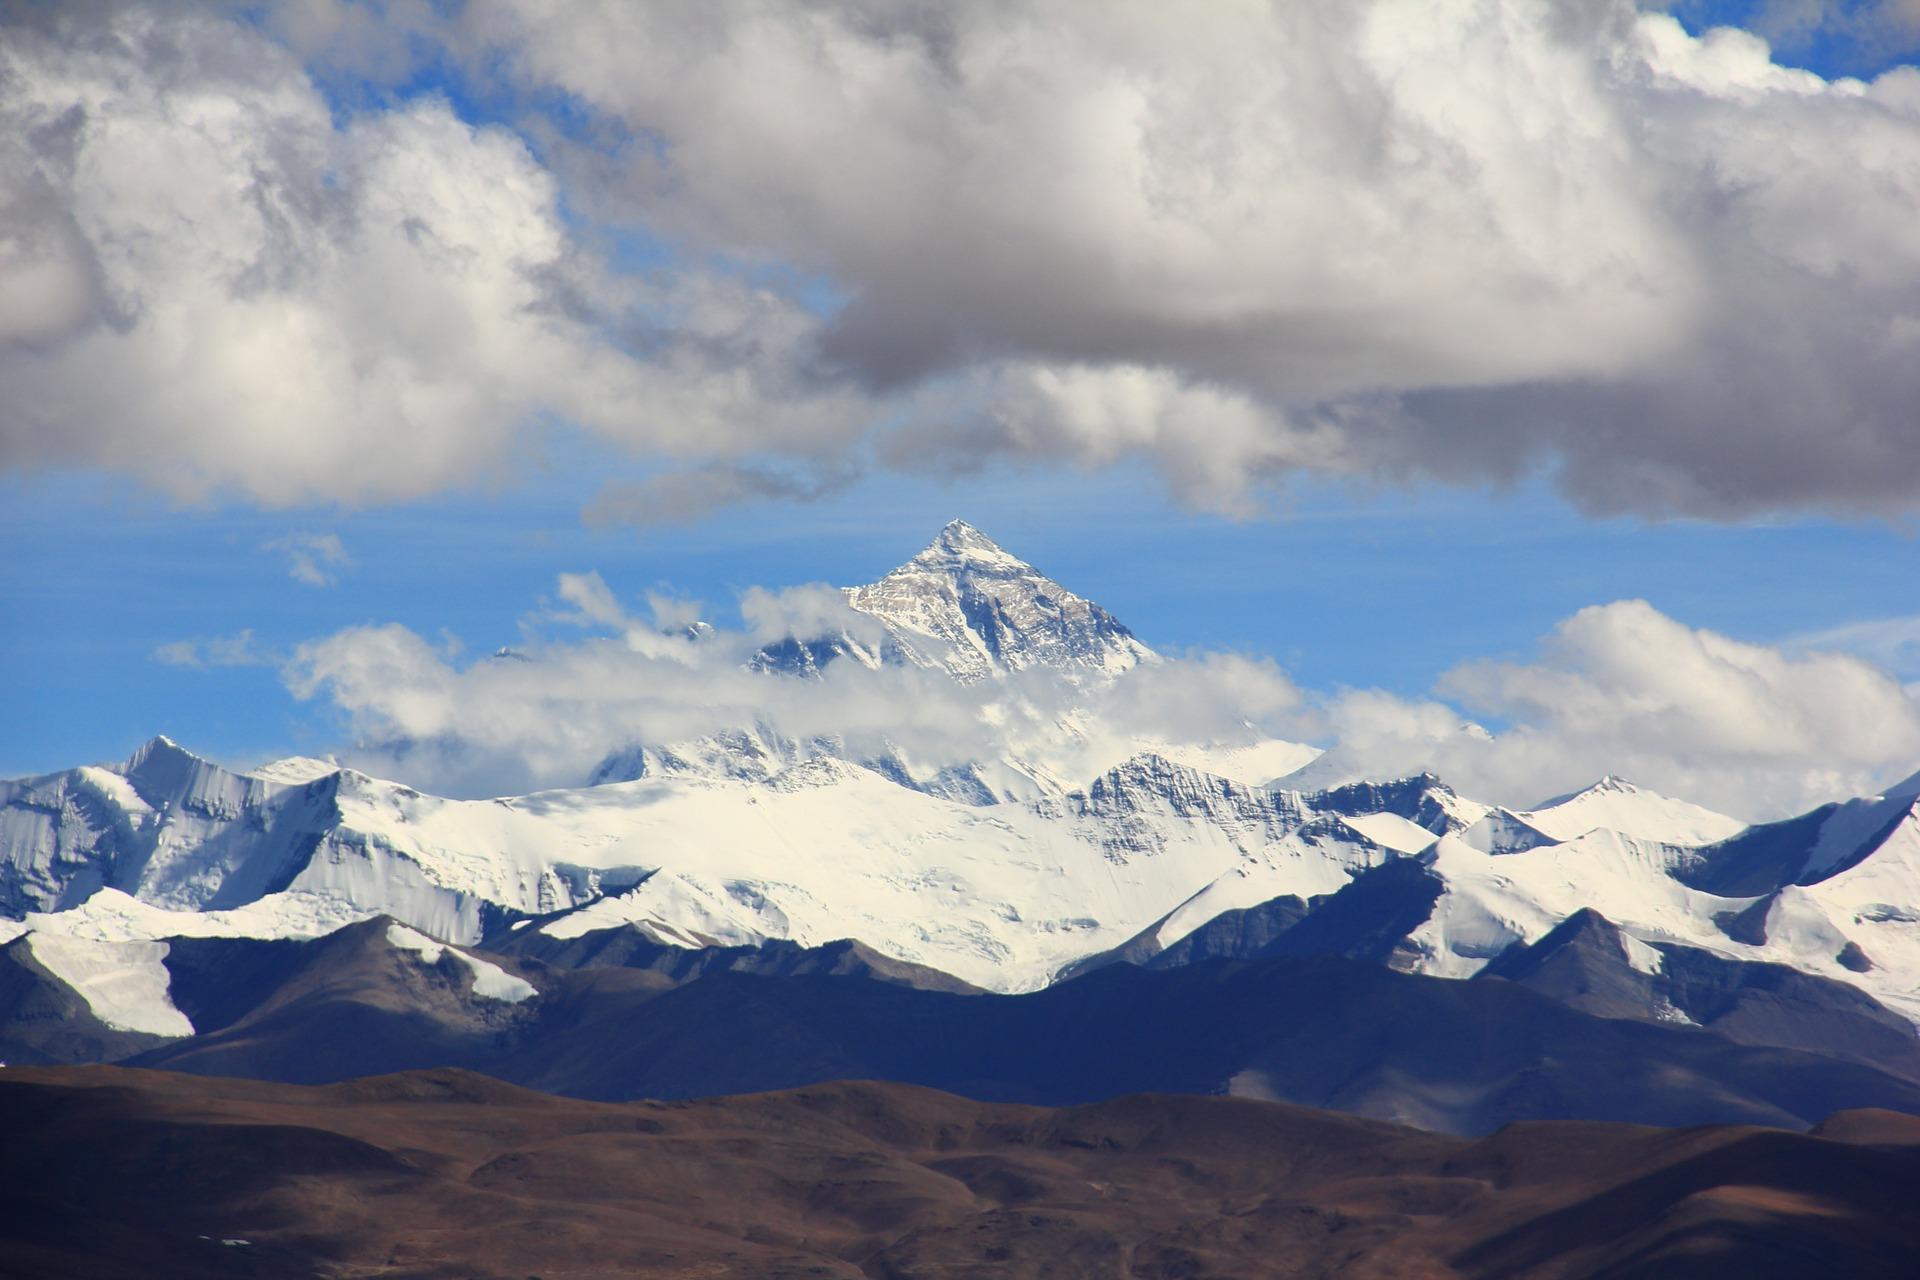 Himalayas Mount Everest, Nepal